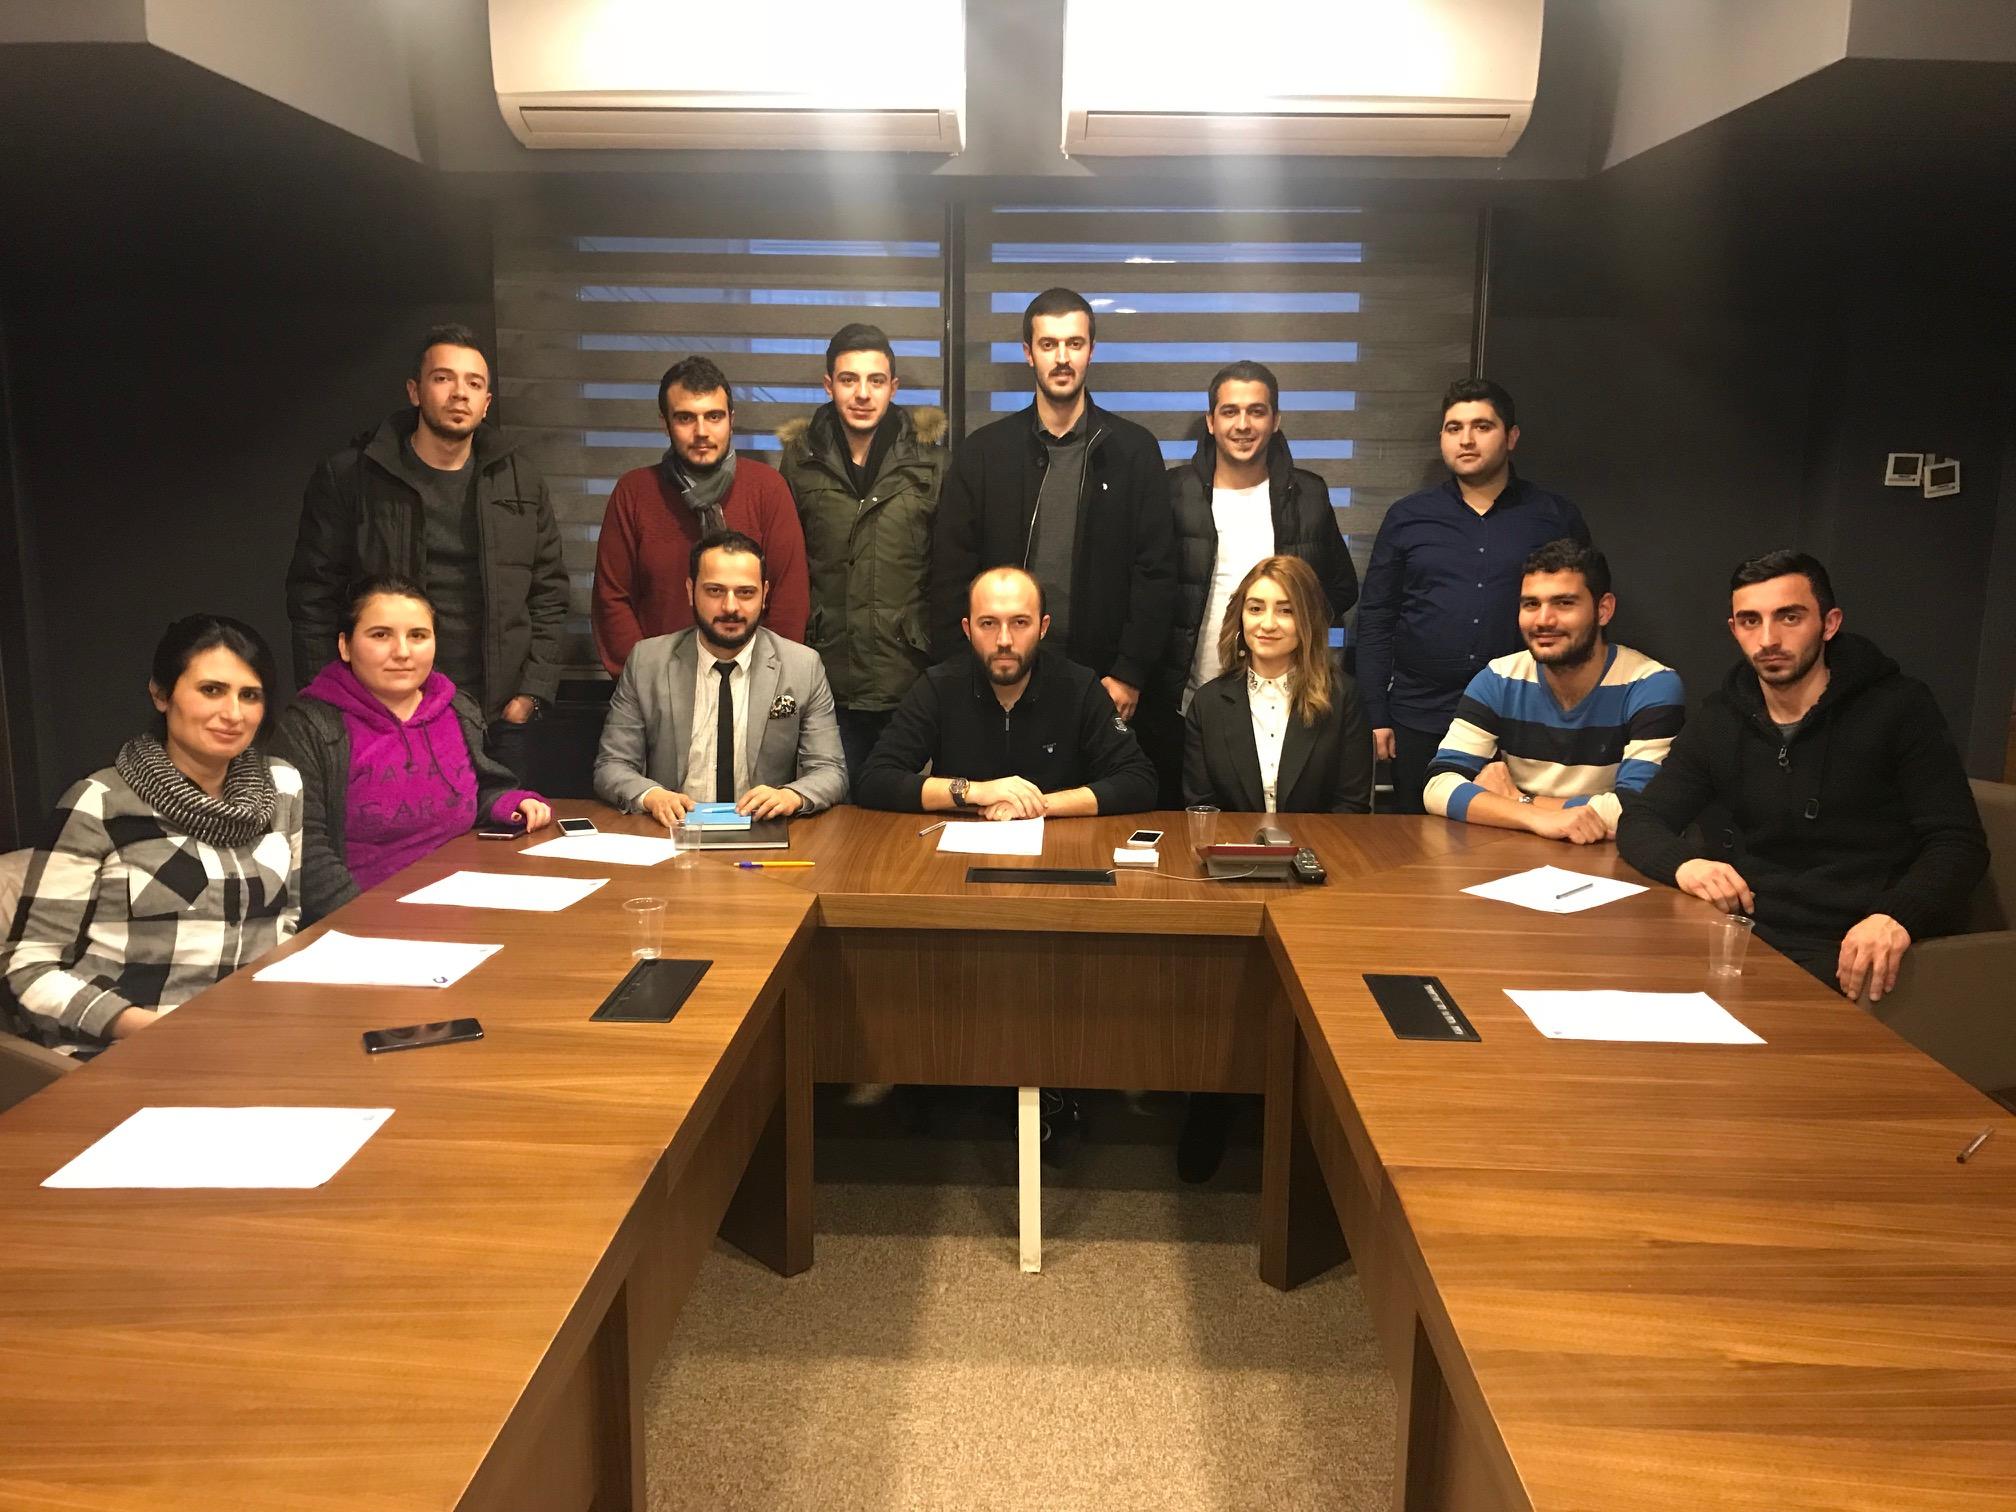 CHP'li gençler dergi çıkaracak